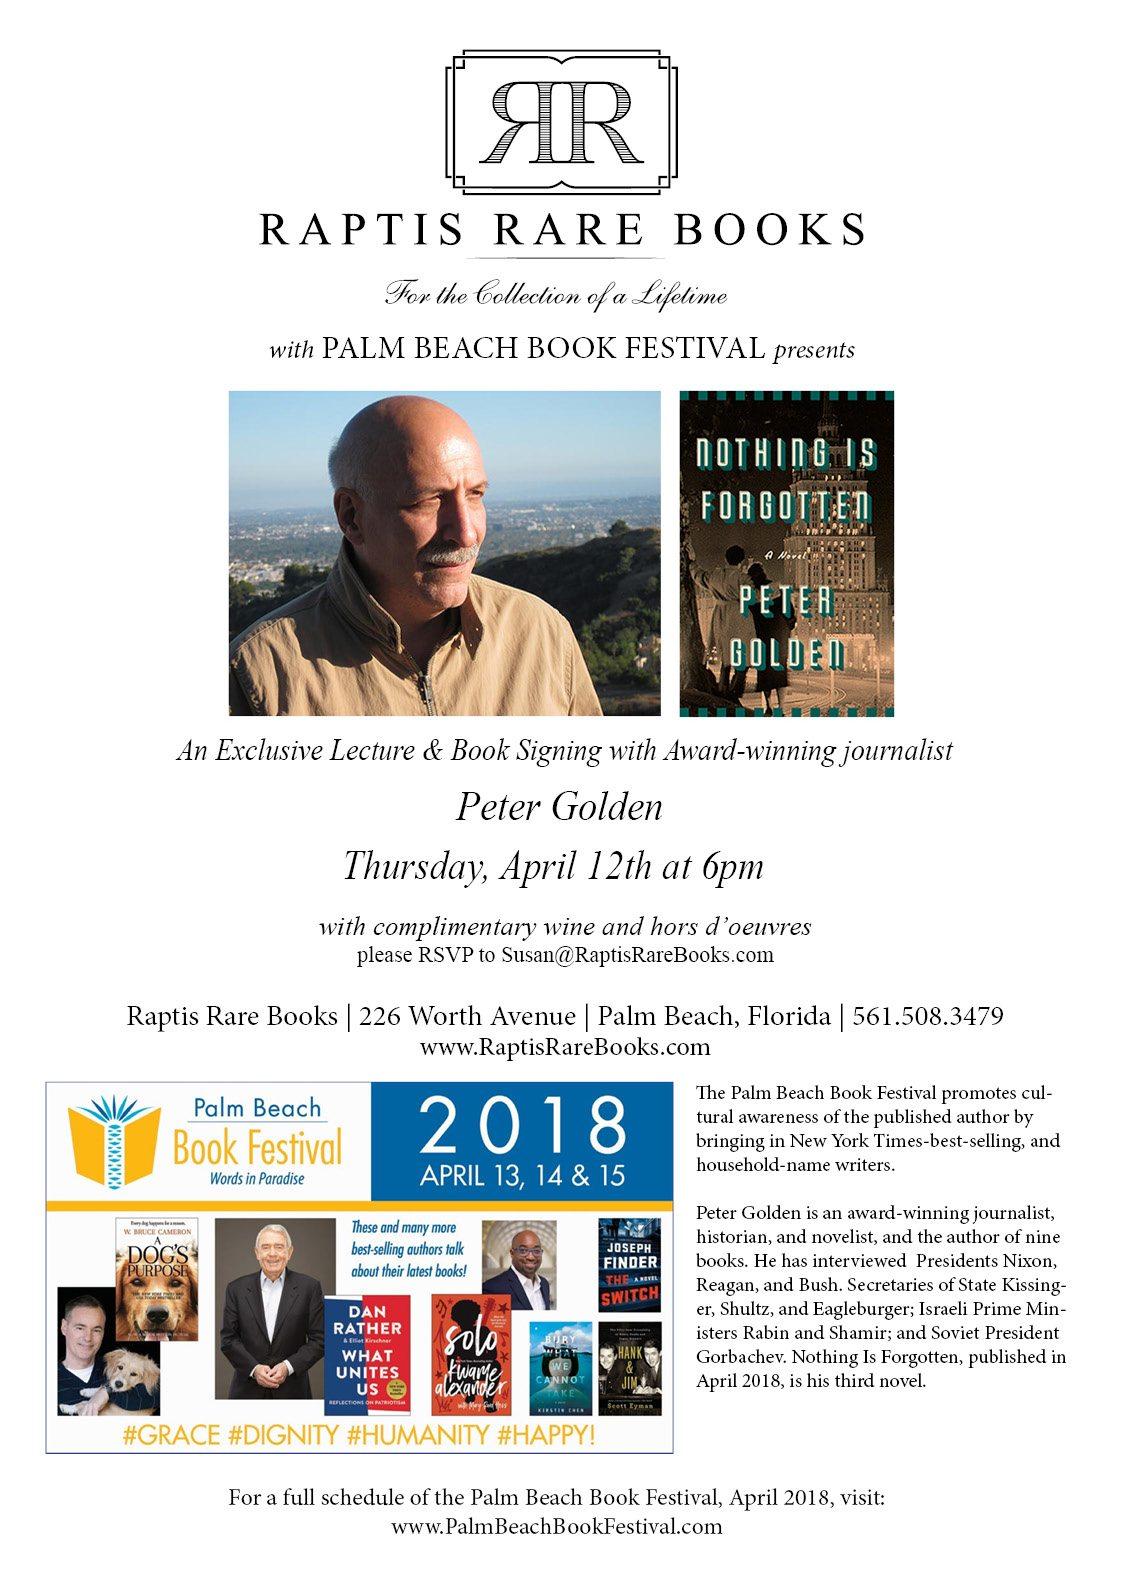 Peter Golden Raptis Rare Books Palm Beach Book Festival April 12 2018